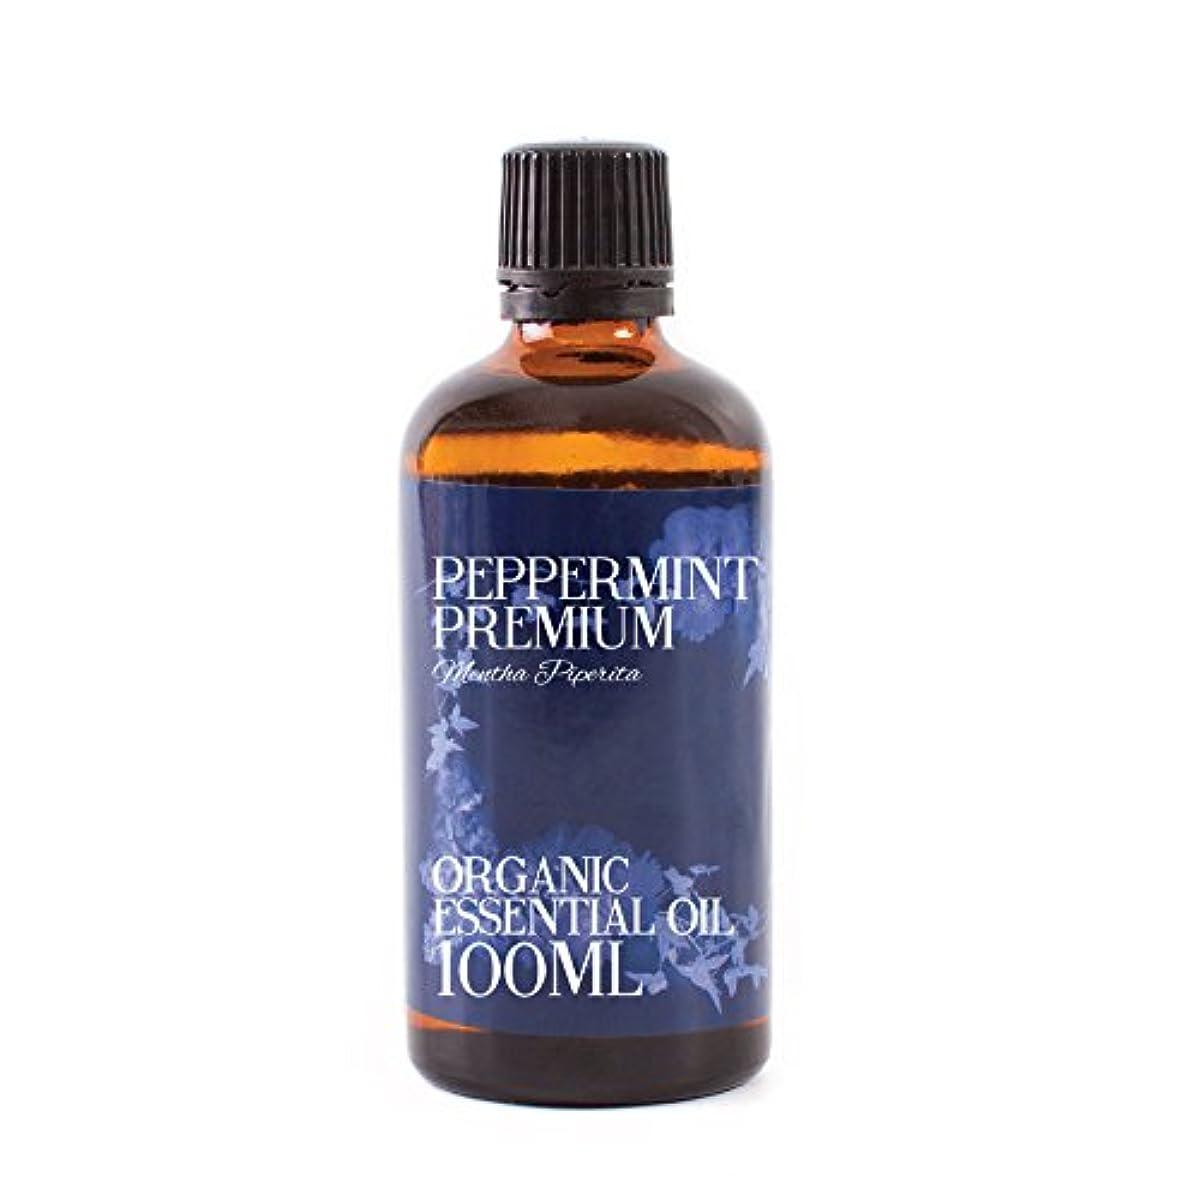 Mystic Moments   Peppermint Premium Organic Essential Oil - 100ml - 100% Pure